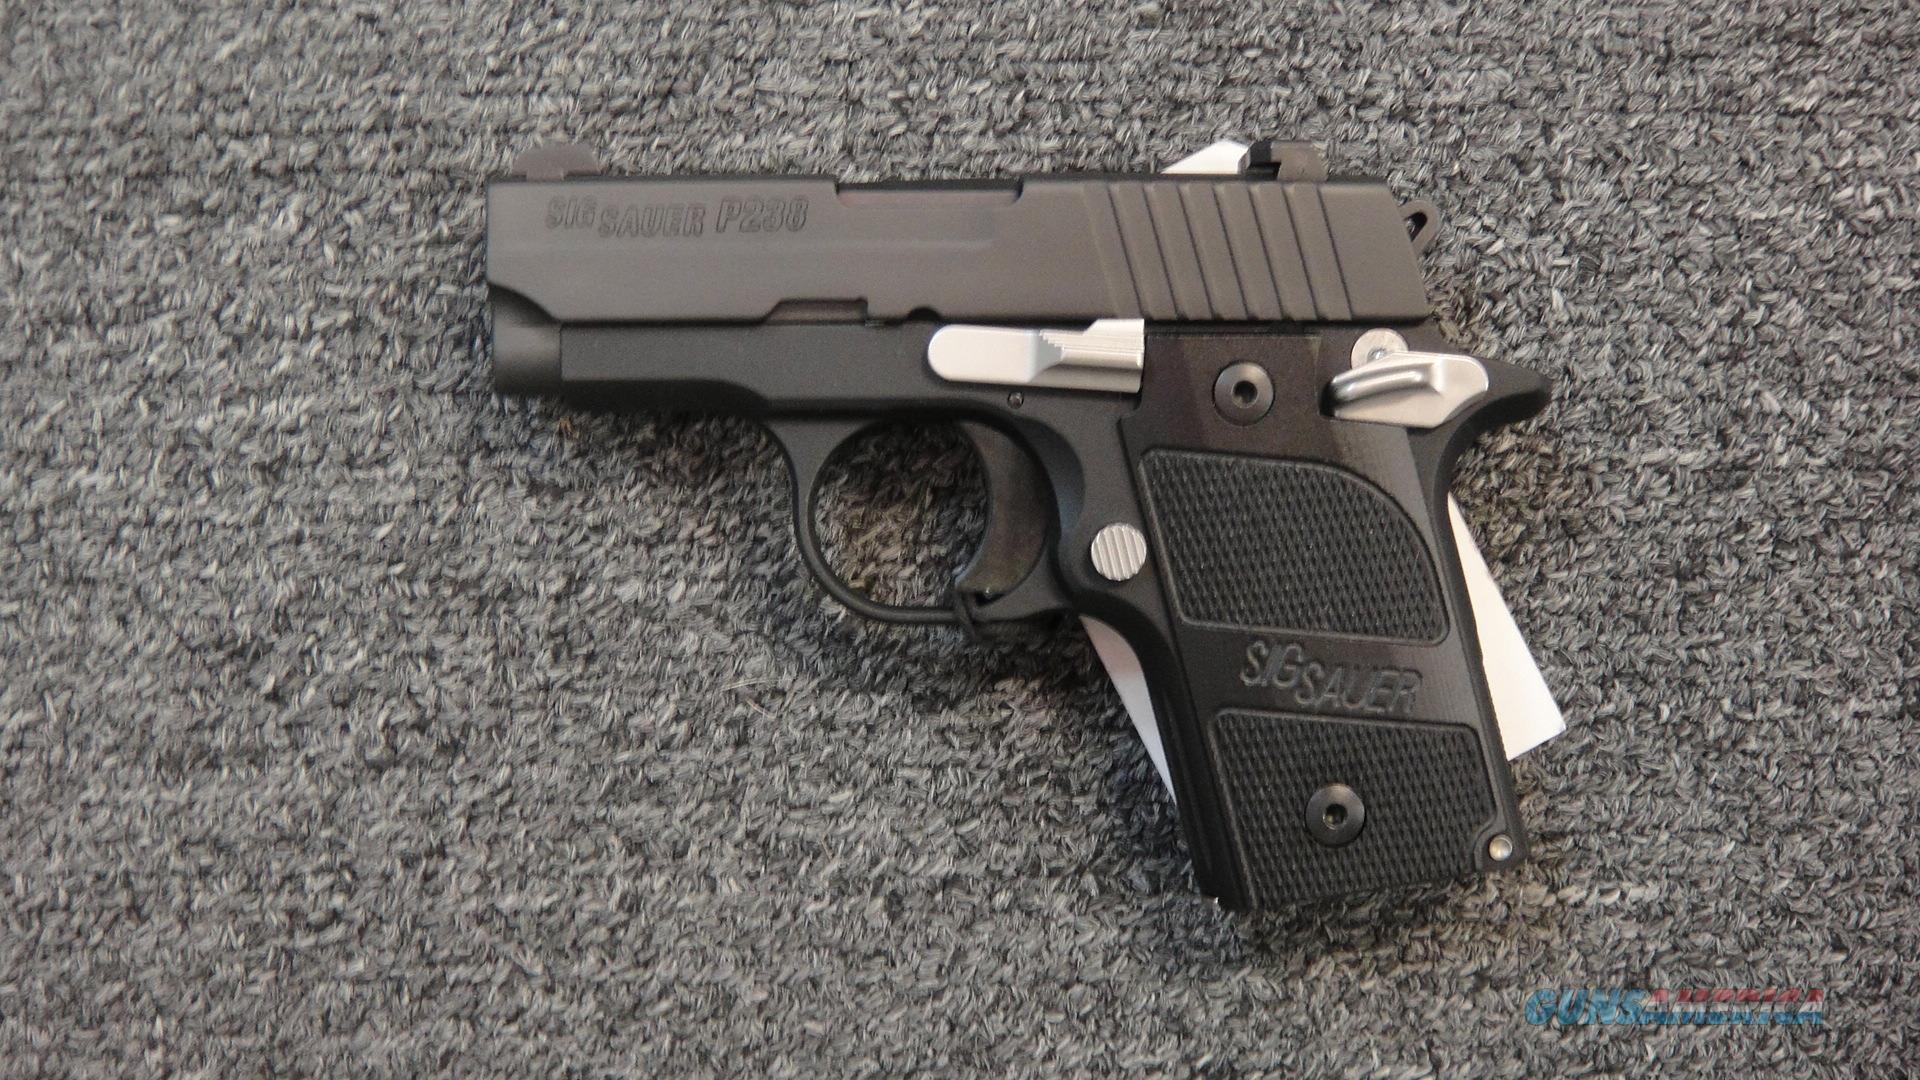 Sig Sauer P238 Nightmare  Guns > Pistols > Sig - Sauer/Sigarms Pistols > P238